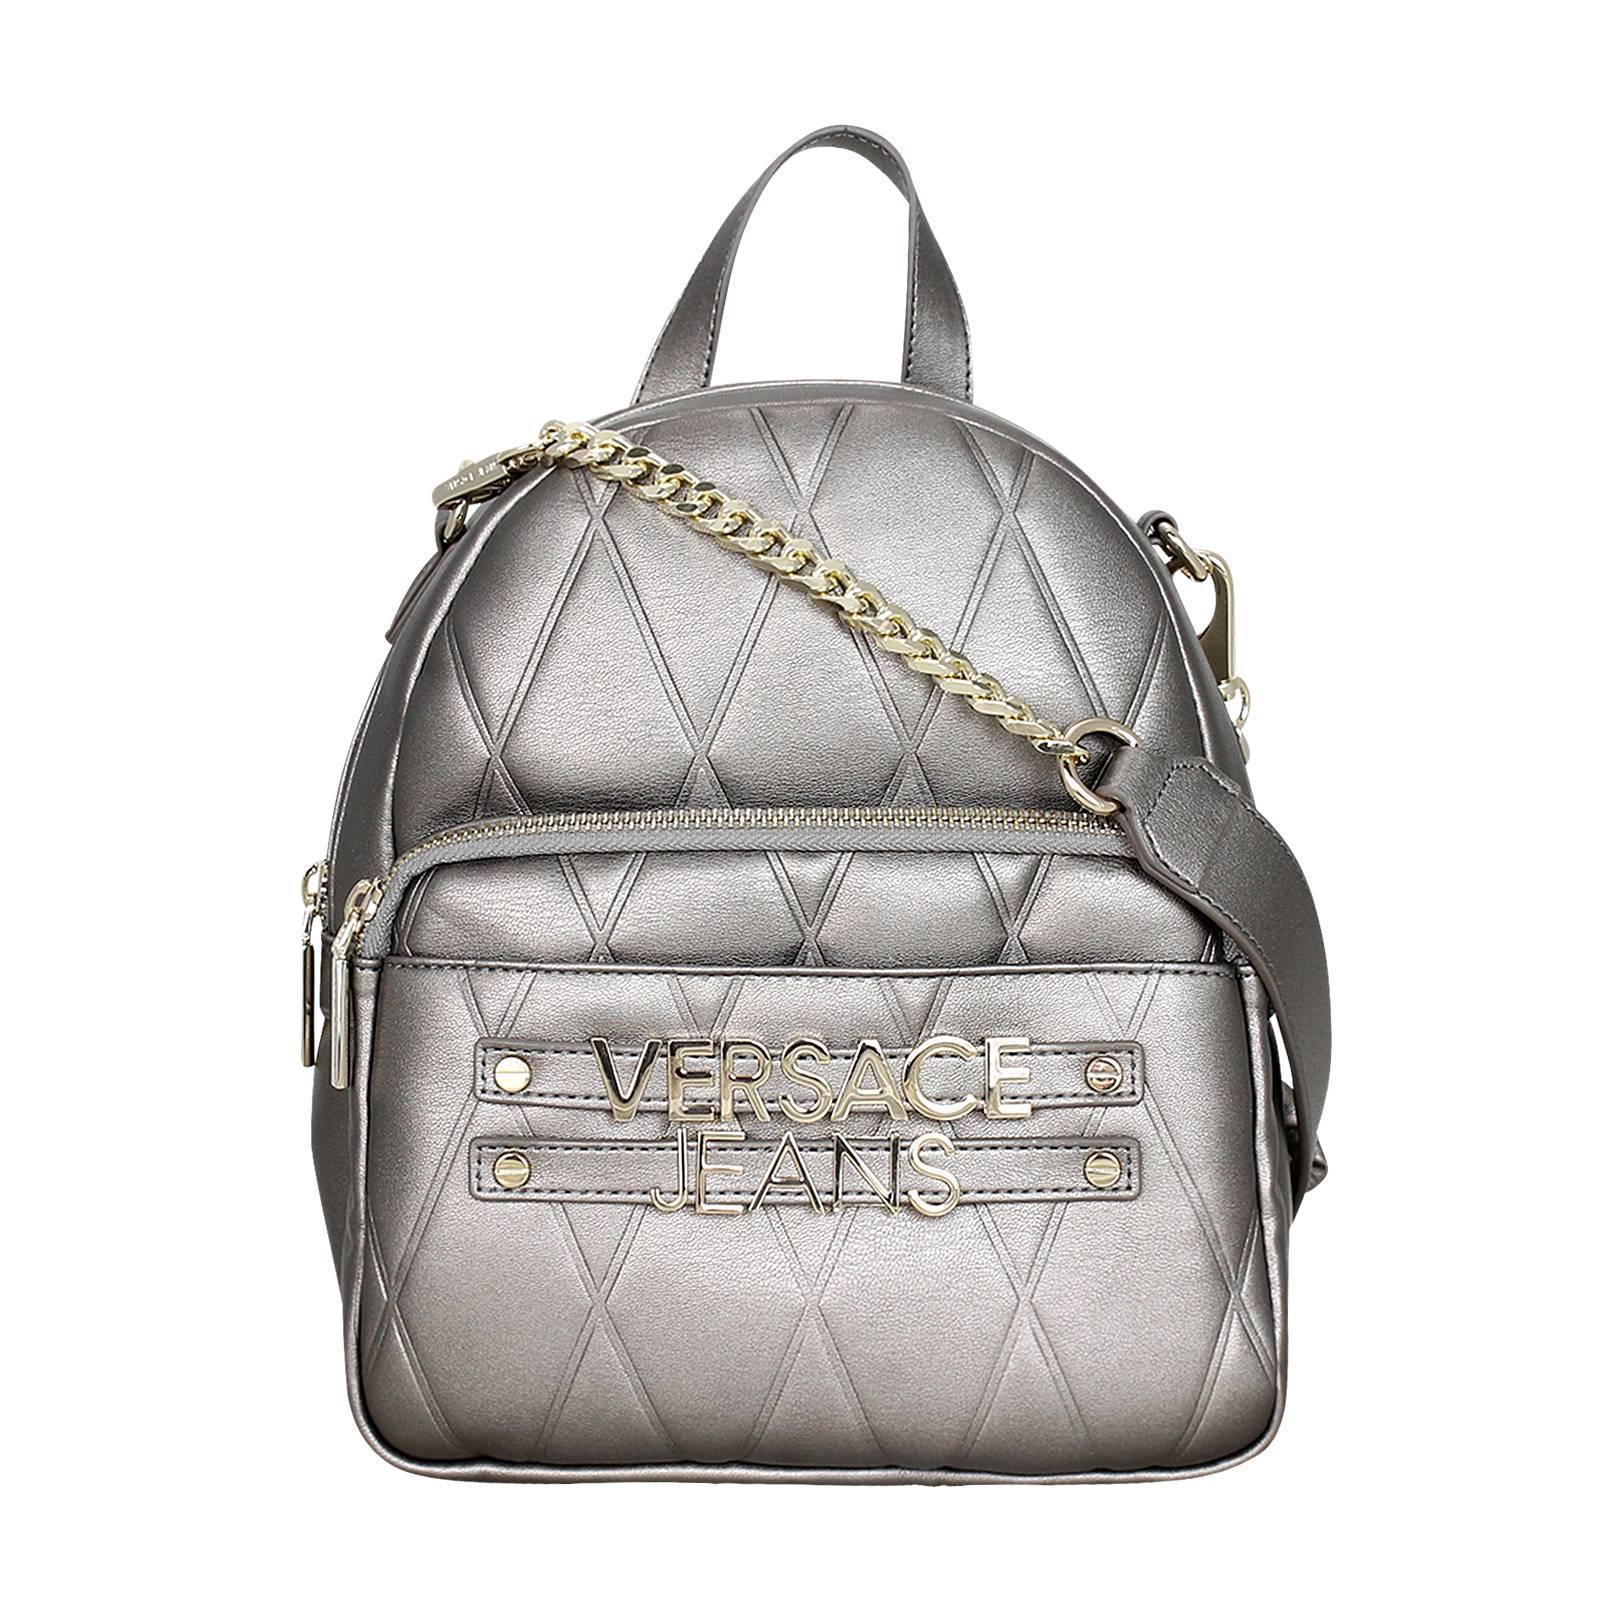 Tepeji - Γυναικεία τσάντα Versace Jeans από δερμα συνθετικο - Gianna ... 5953cab538e